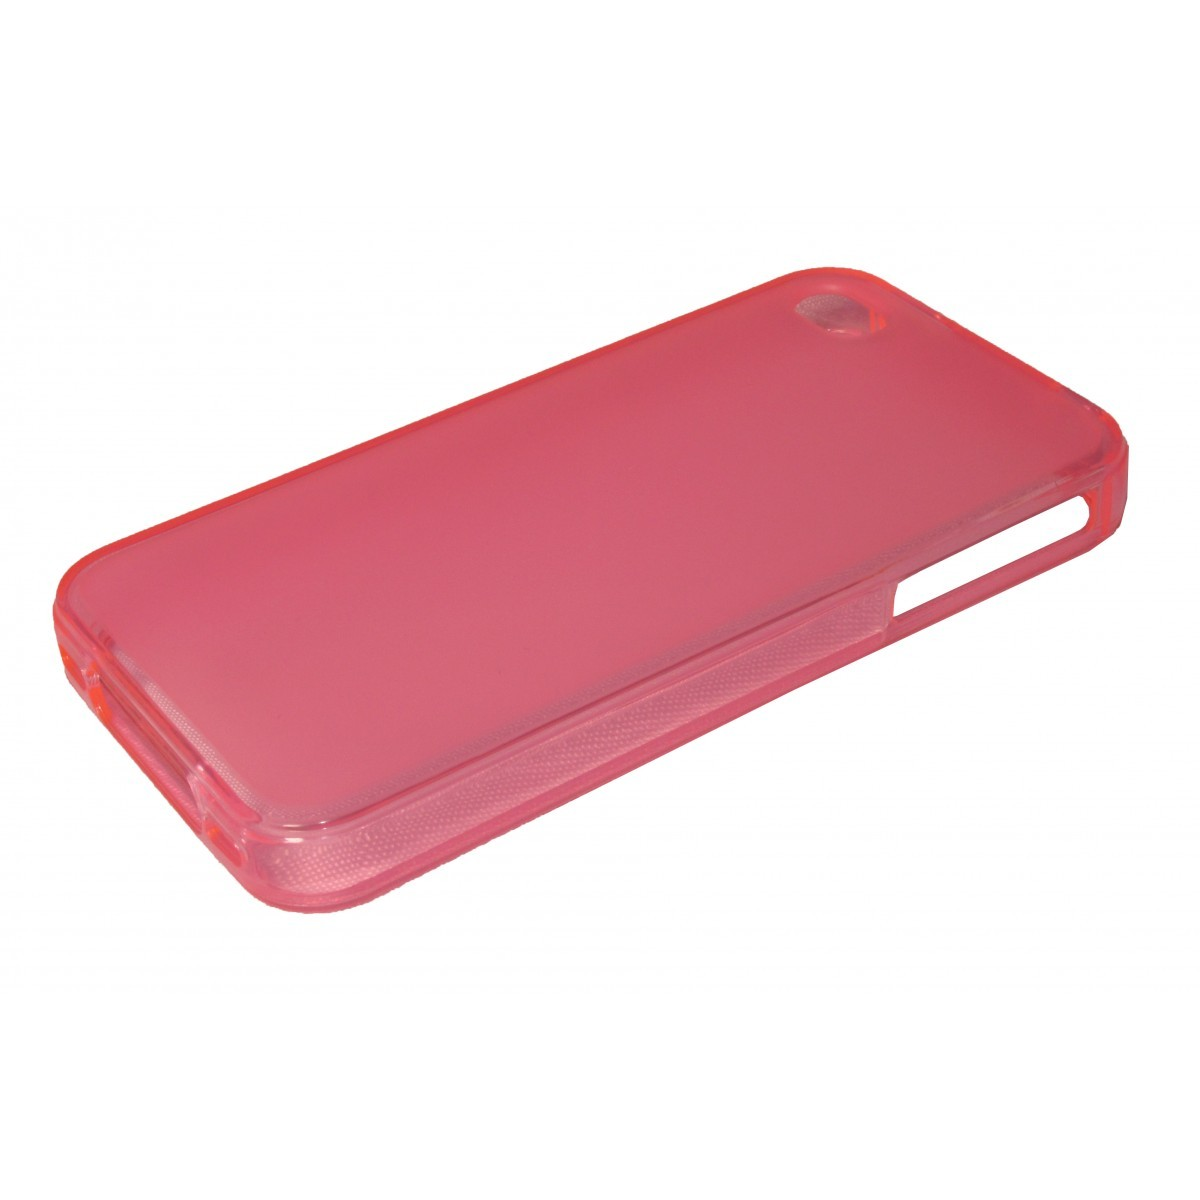 Capa de Tpu para Iphone 4 4S  Pelicula Rosa - Matecki